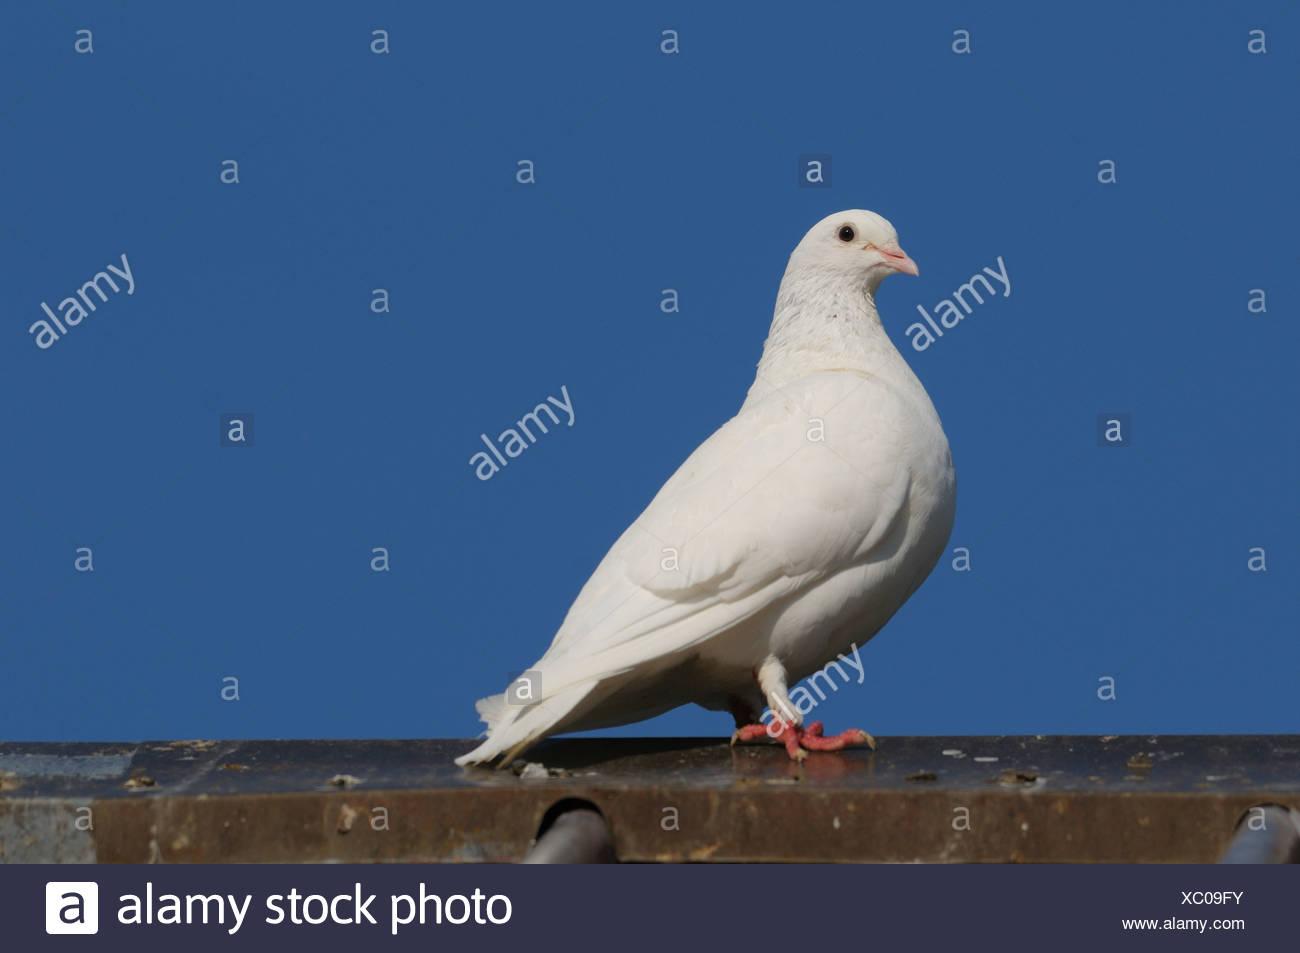 white dove - Stock Image